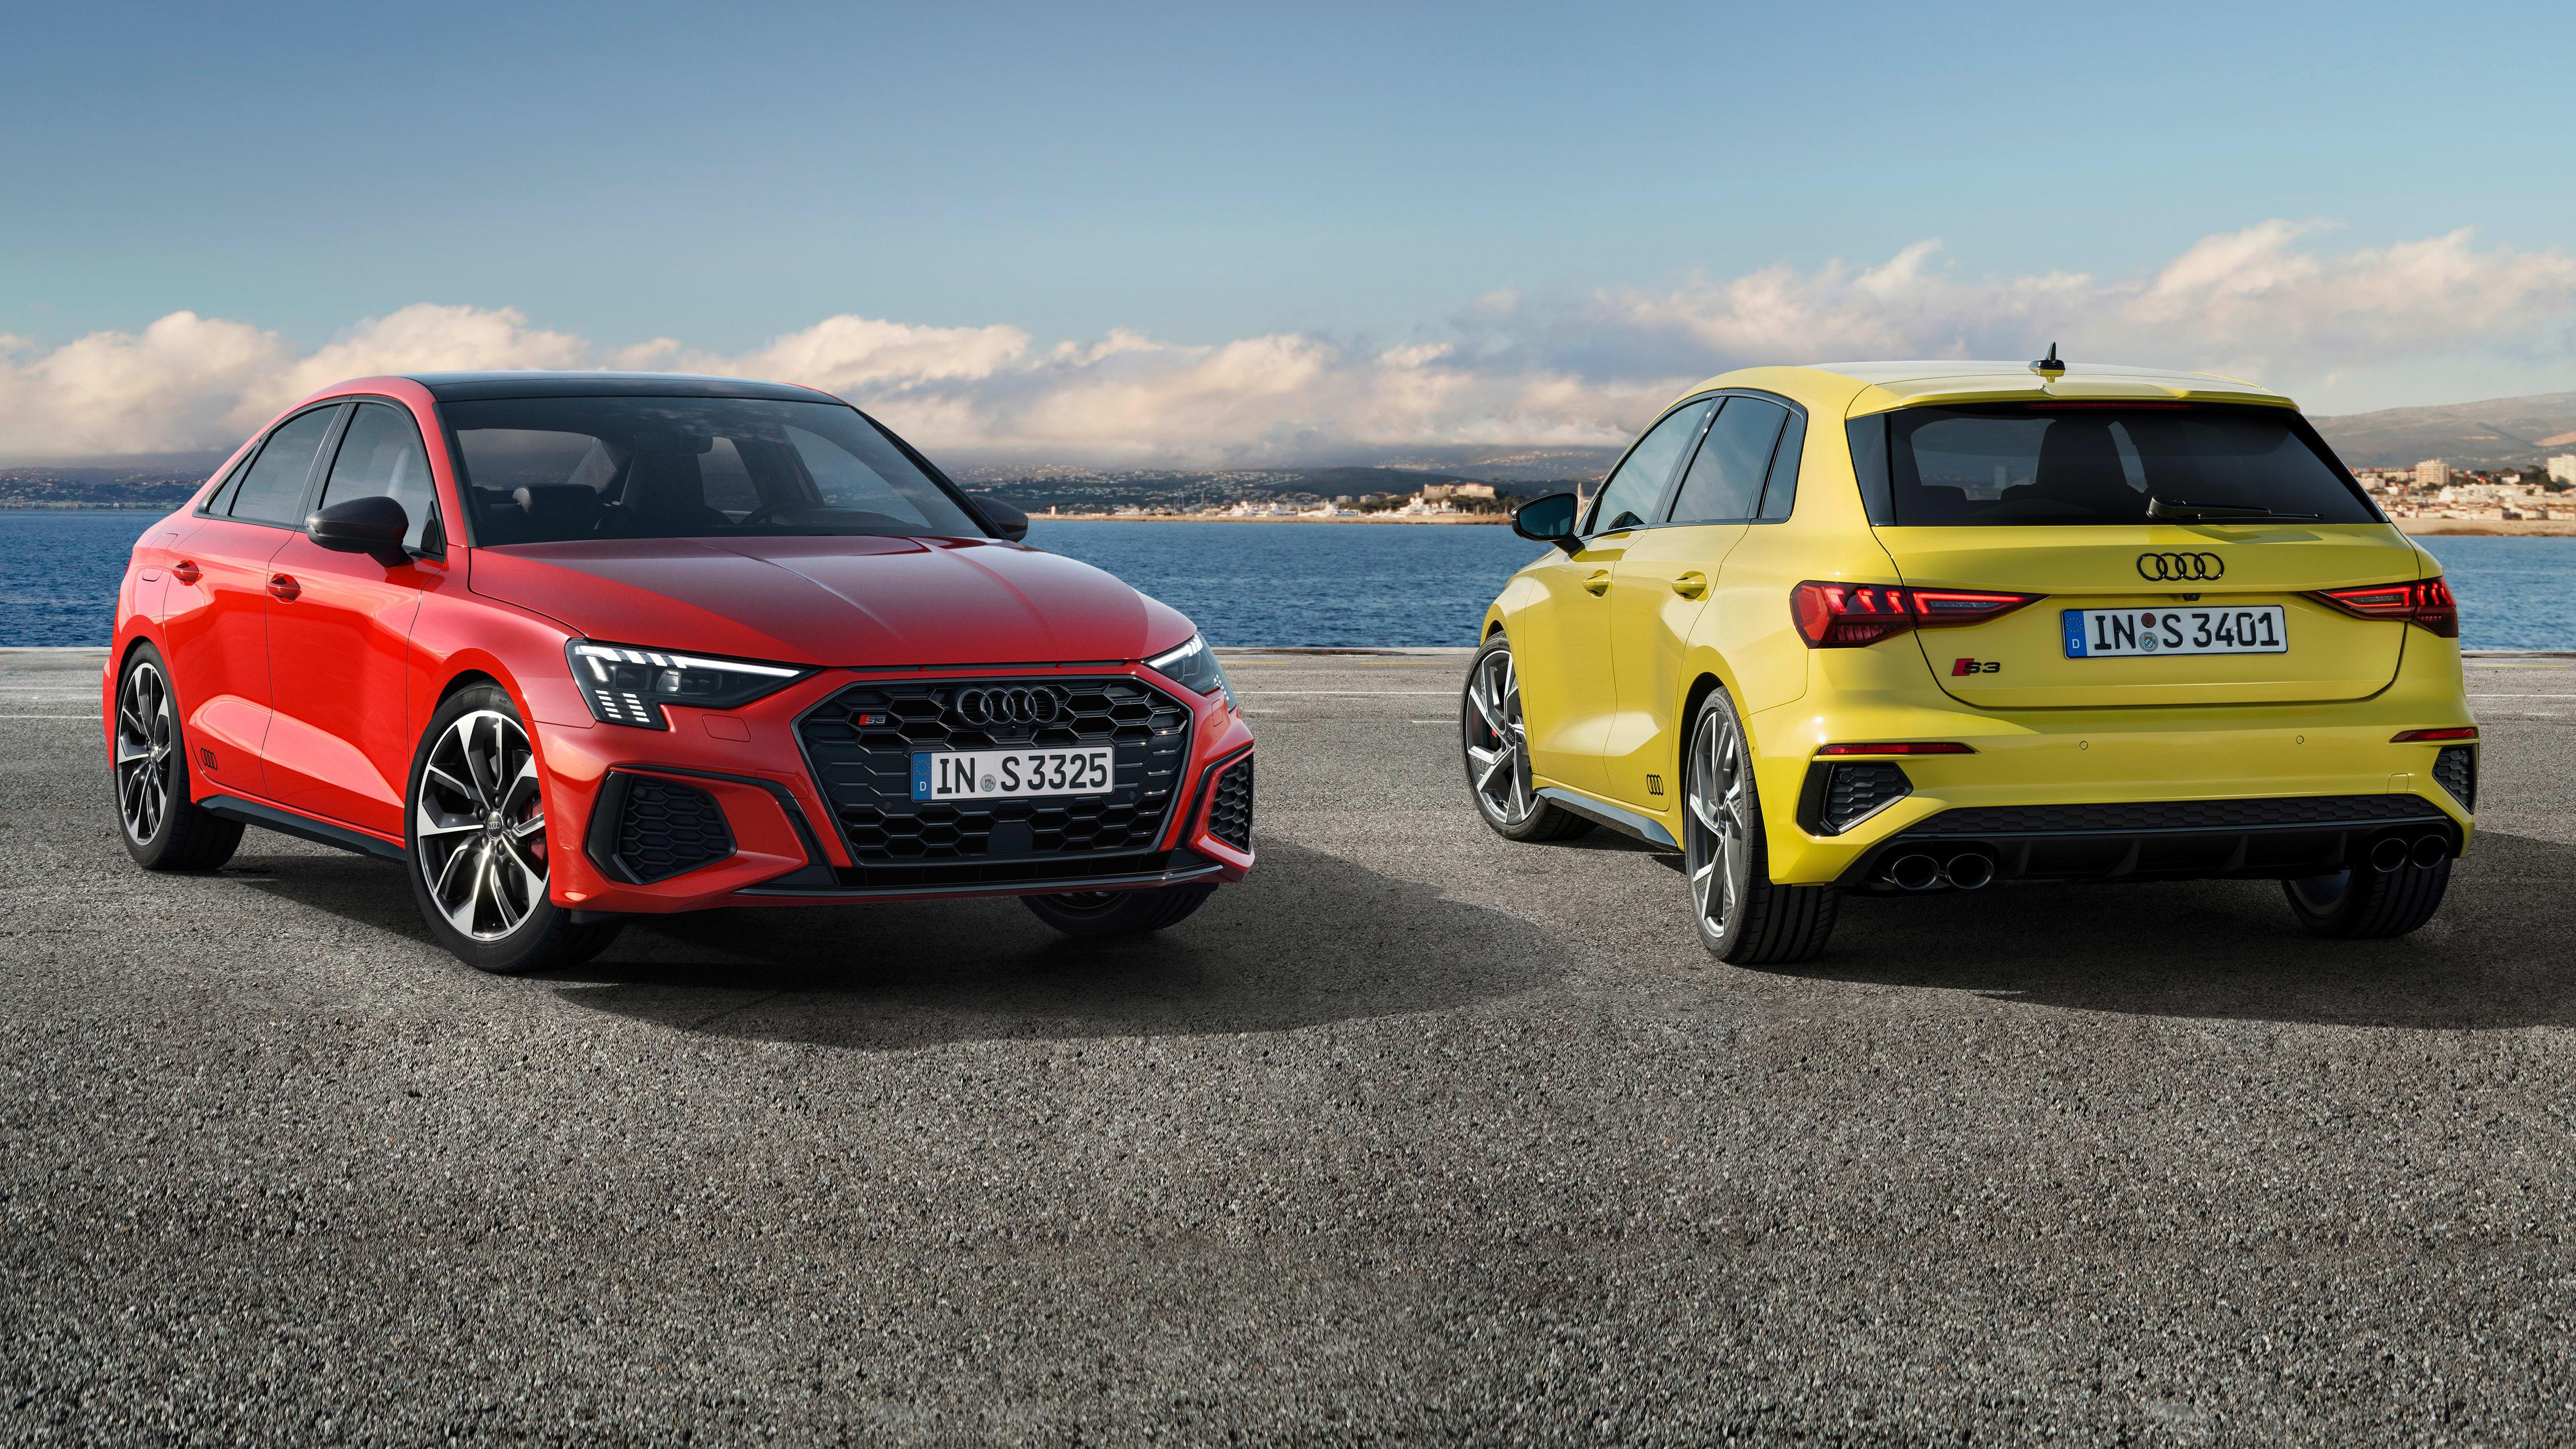 2021 Audi S3 Sportback And Sedan Revealed Australia Confirmed Caradvice